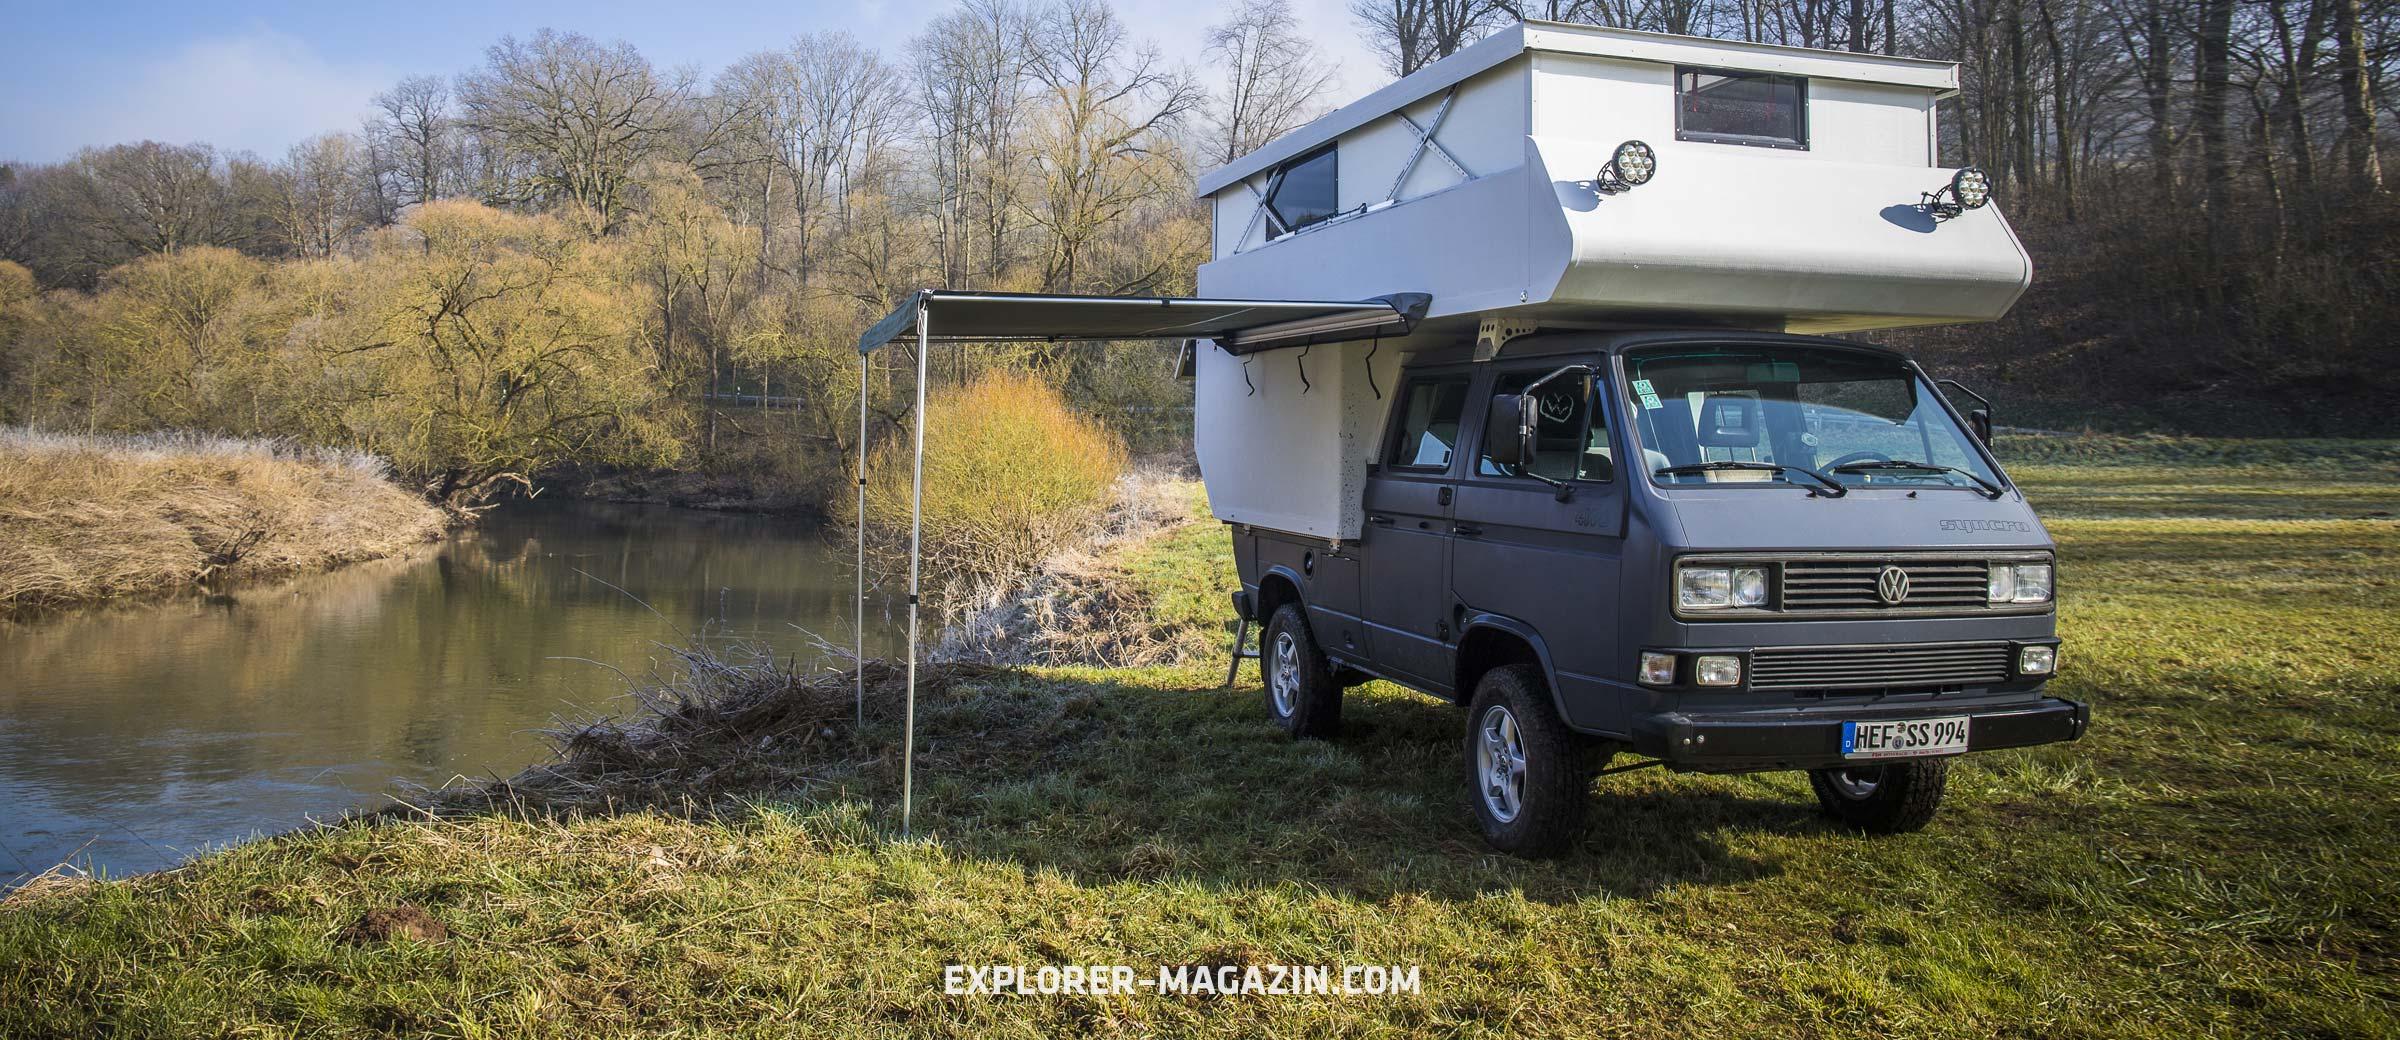 VW T3 Syncro Wohnmobil mit Hubdachkabine selbst gebaut